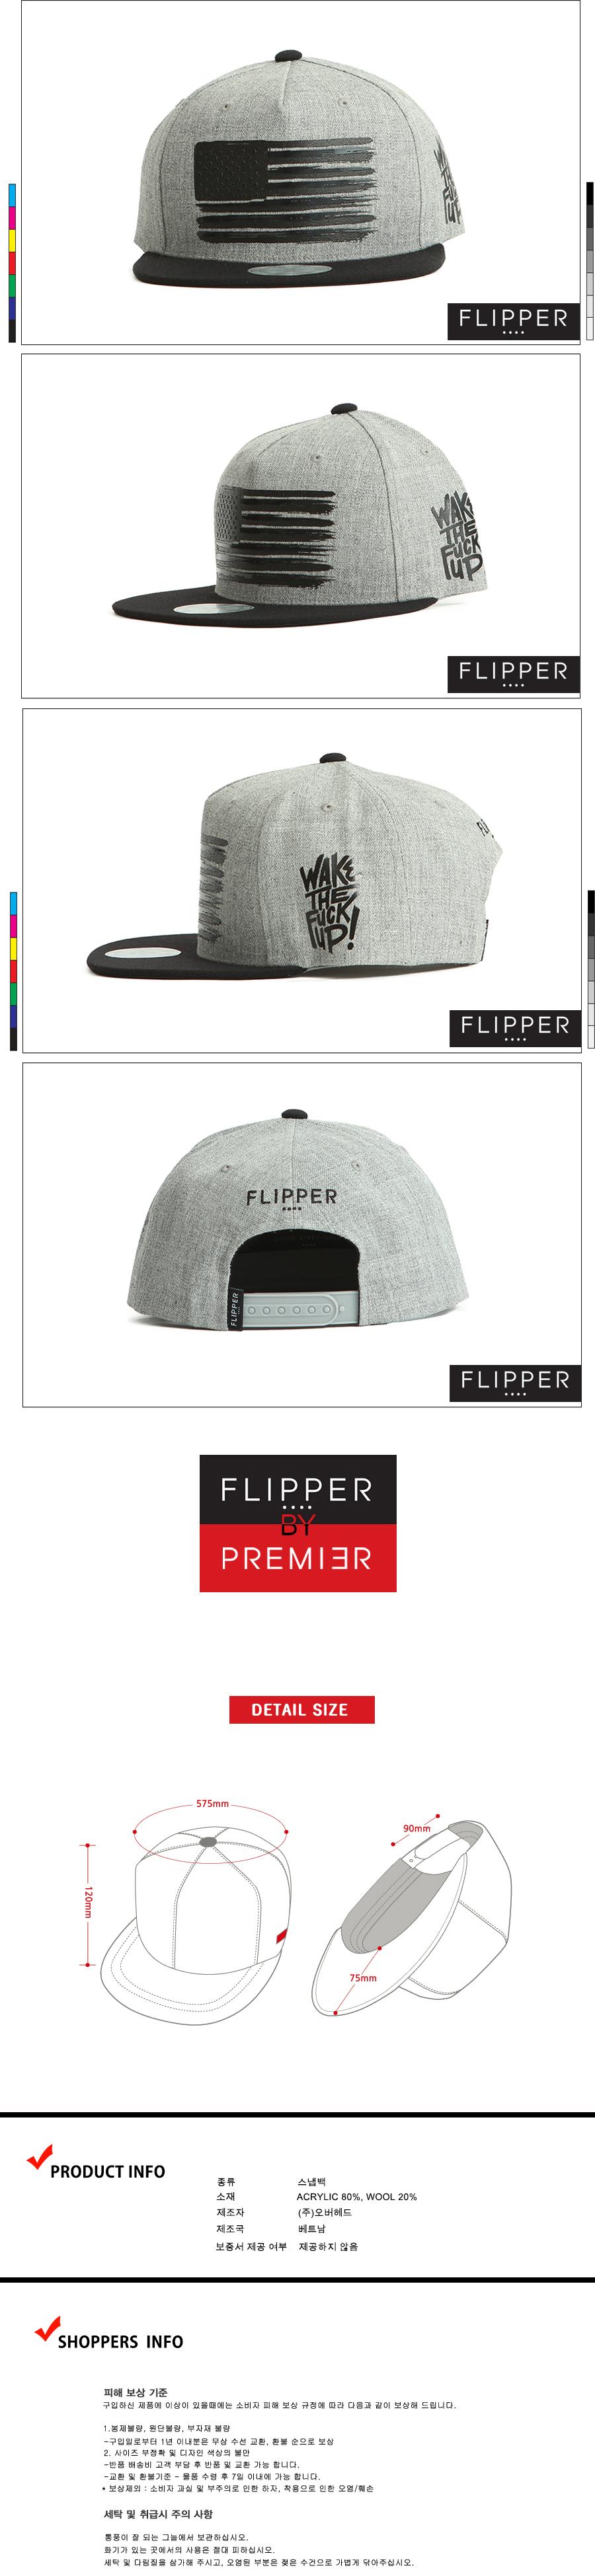 [ PREMIER ] [Premier] Flipper Snapback USA Melange/Black (FL043)